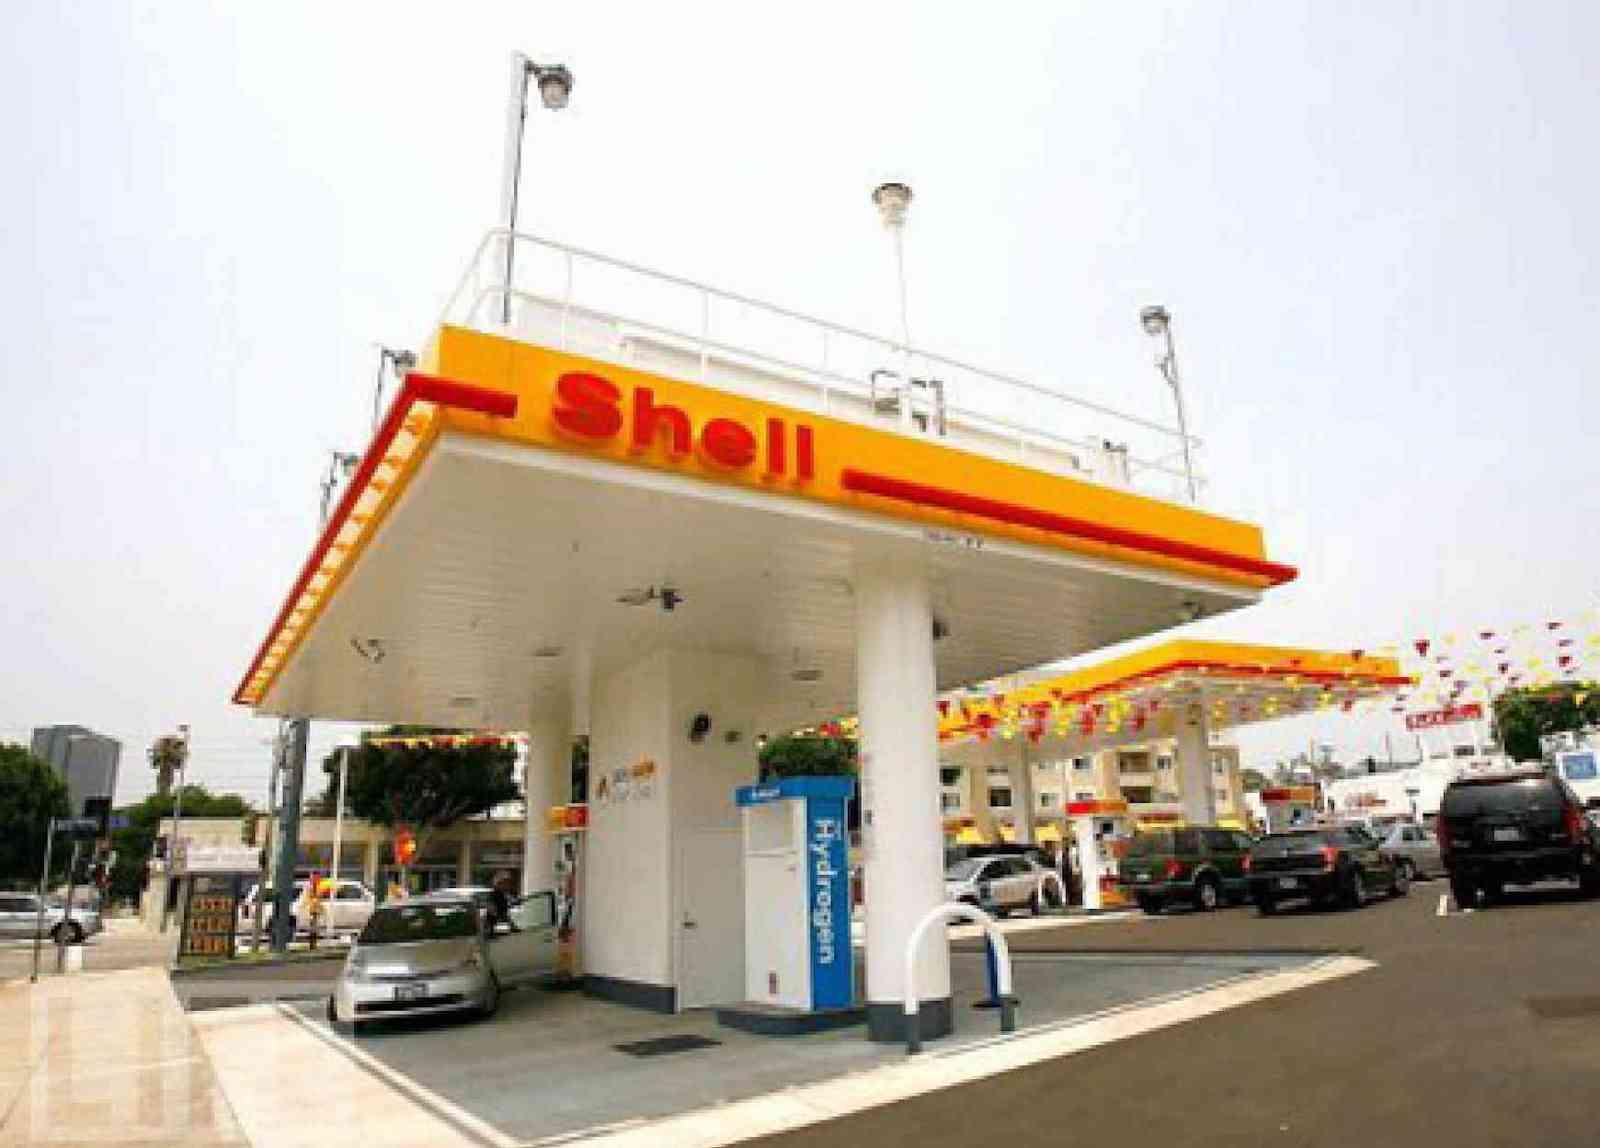 Shell hydrogen filling station located at 11570 Santa Monica Blvd., Los Angeles, California.